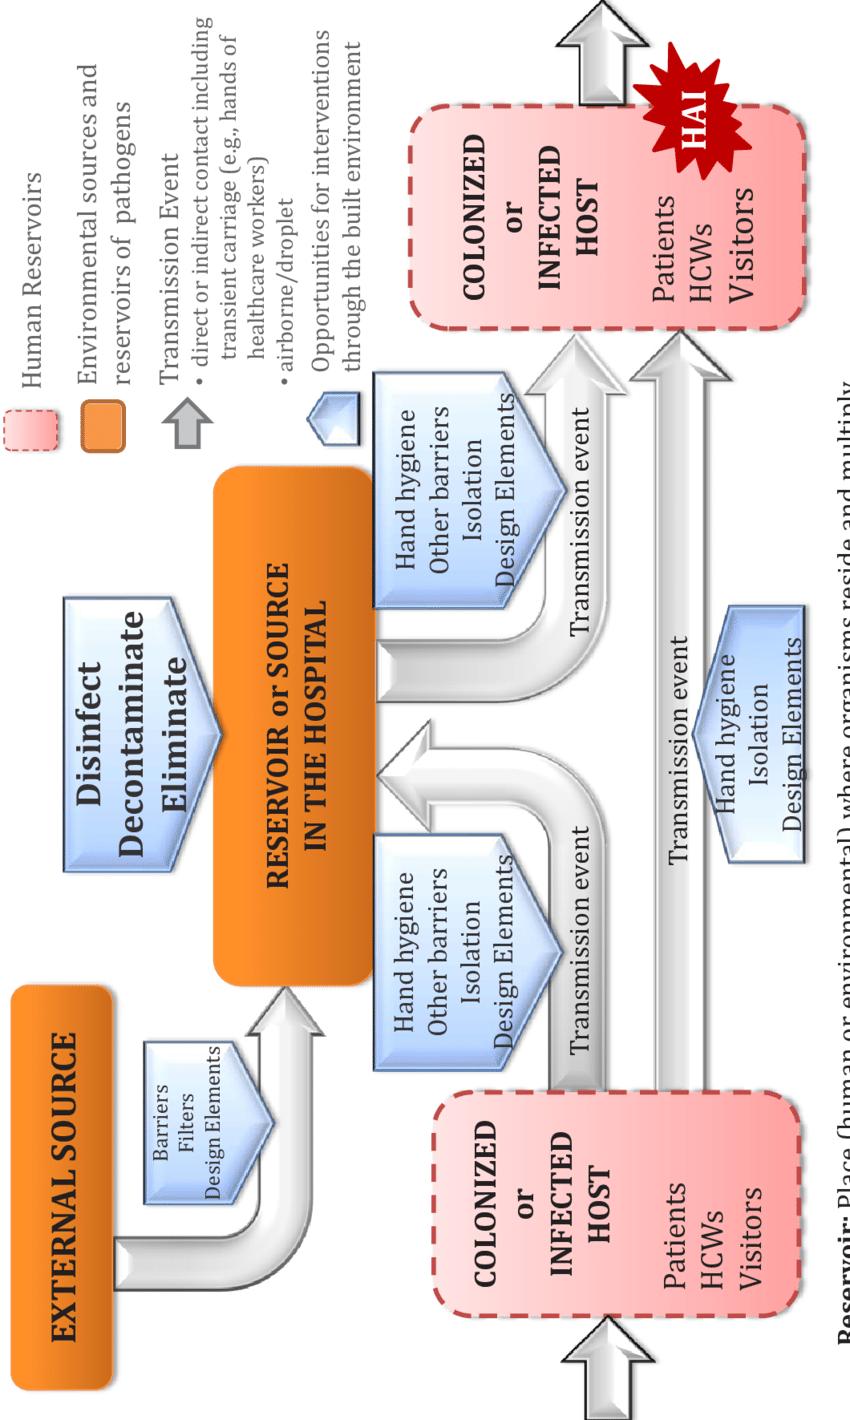 medium resolution of chain of transmission interventions model